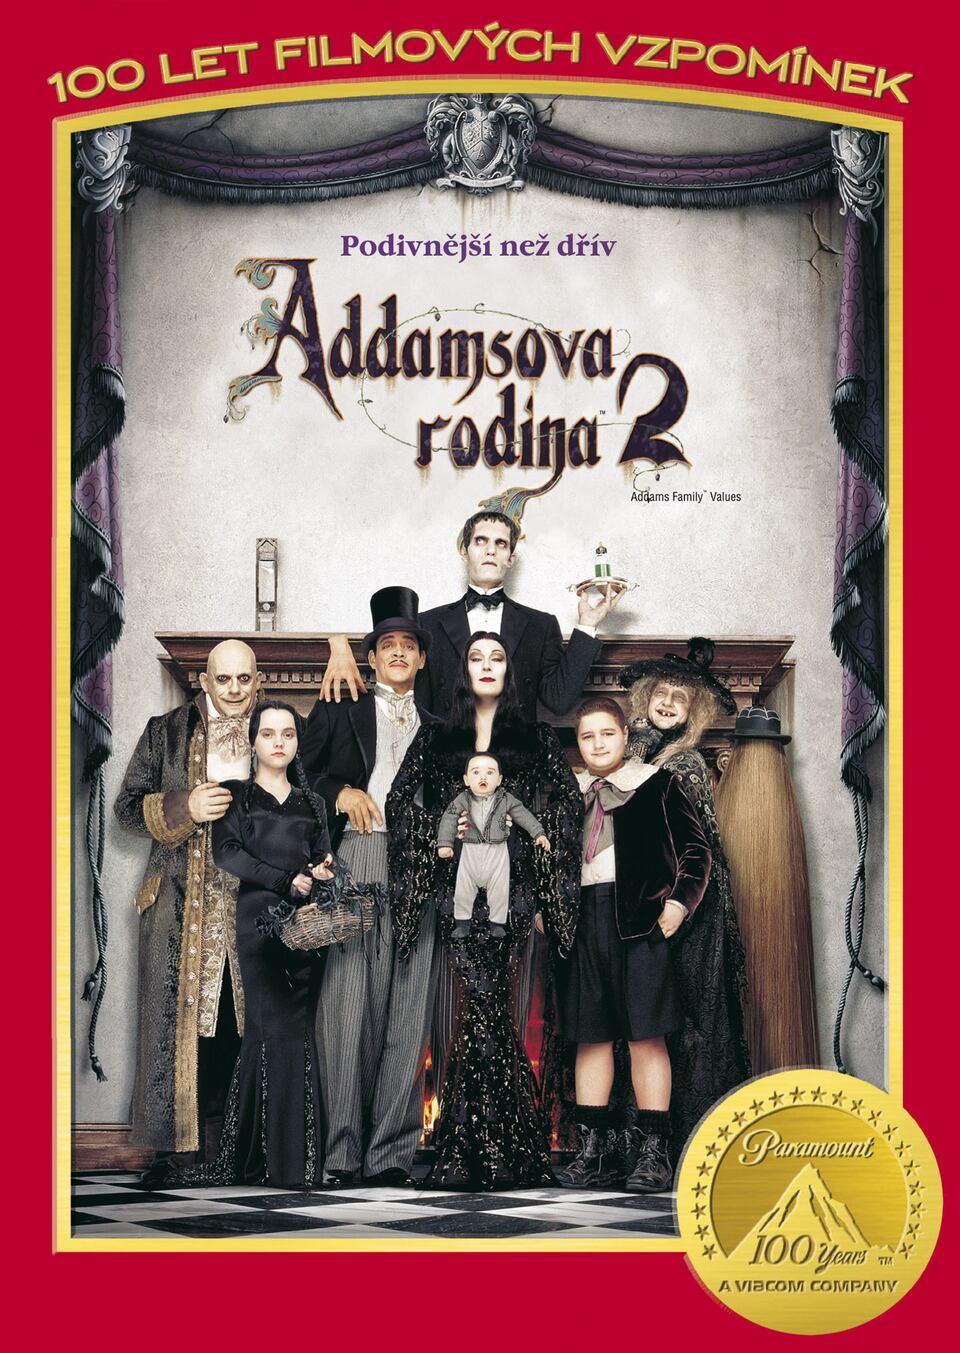 Film Addamsova rodina 2